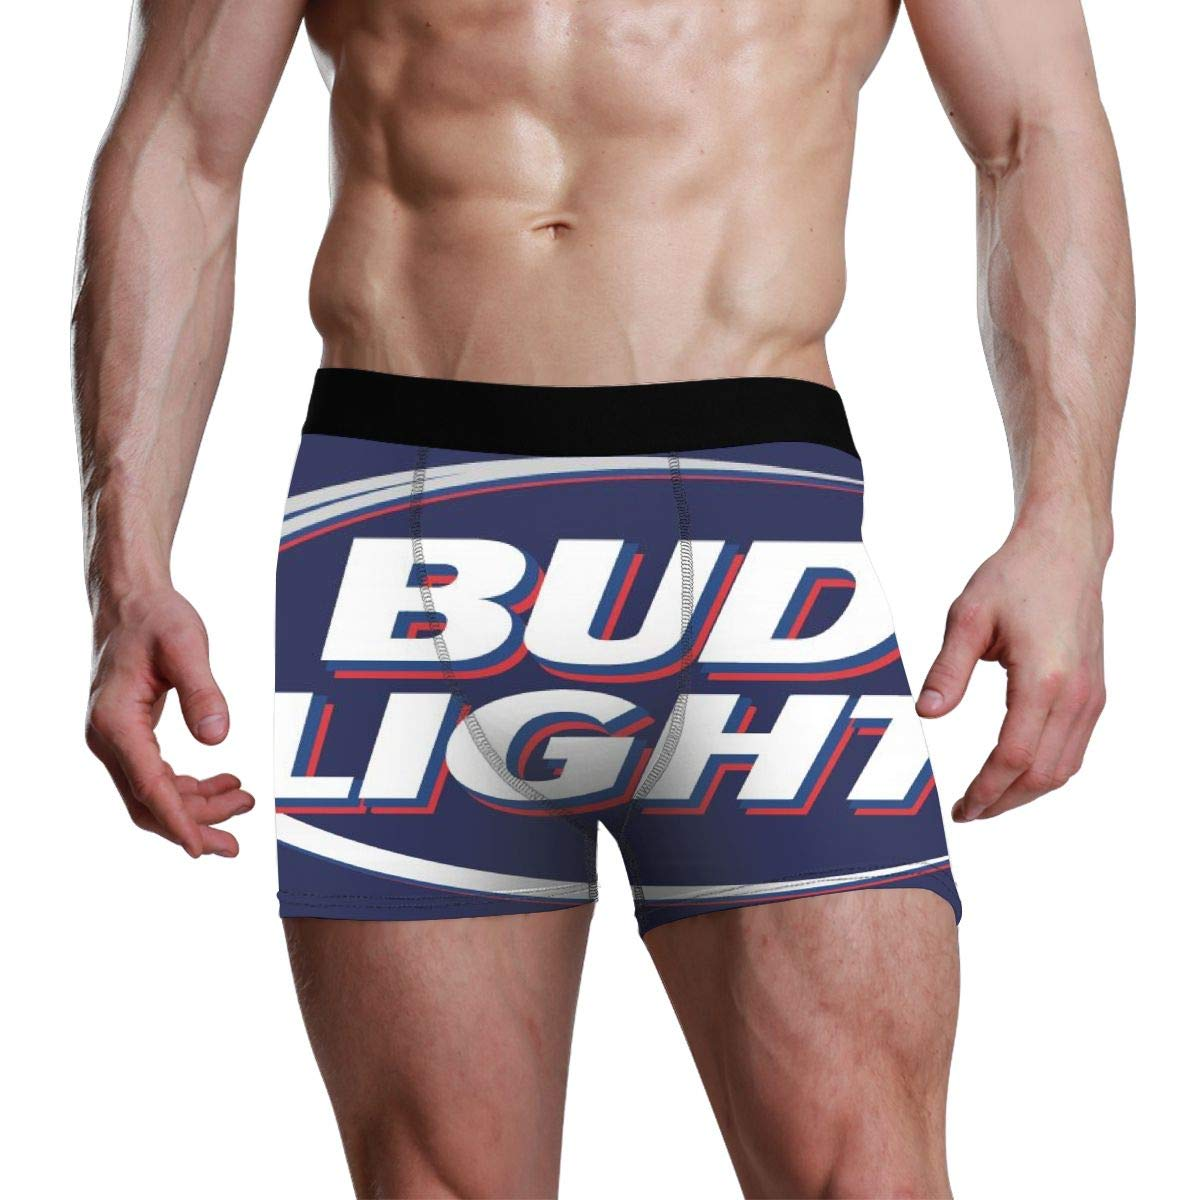 Bud Light Mens Underwear Soft Boxer Briefs Stretch Boxer Trunks